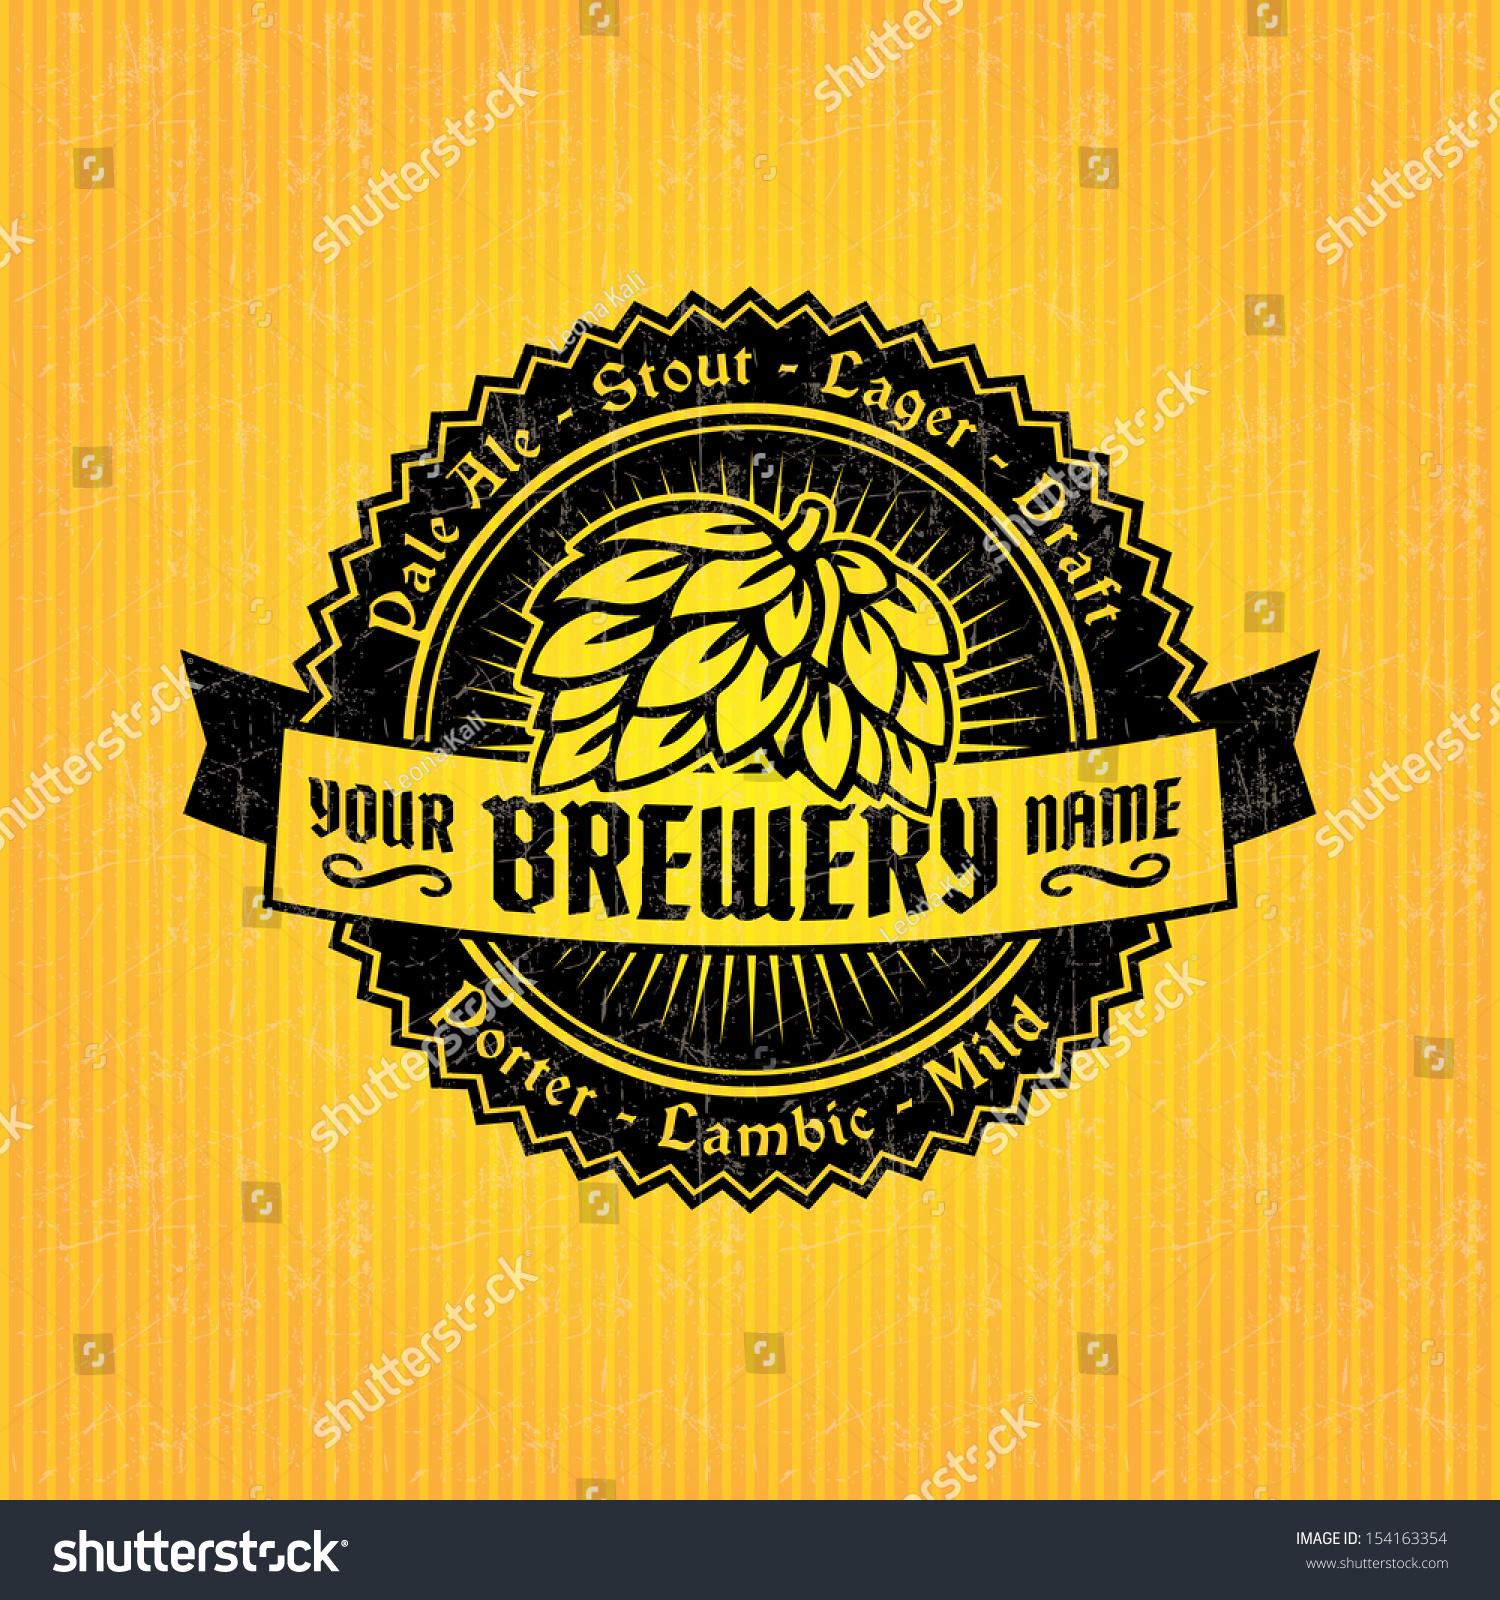 beer label design template stock vector 154163354 shutterstock. Black Bedroom Furniture Sets. Home Design Ideas